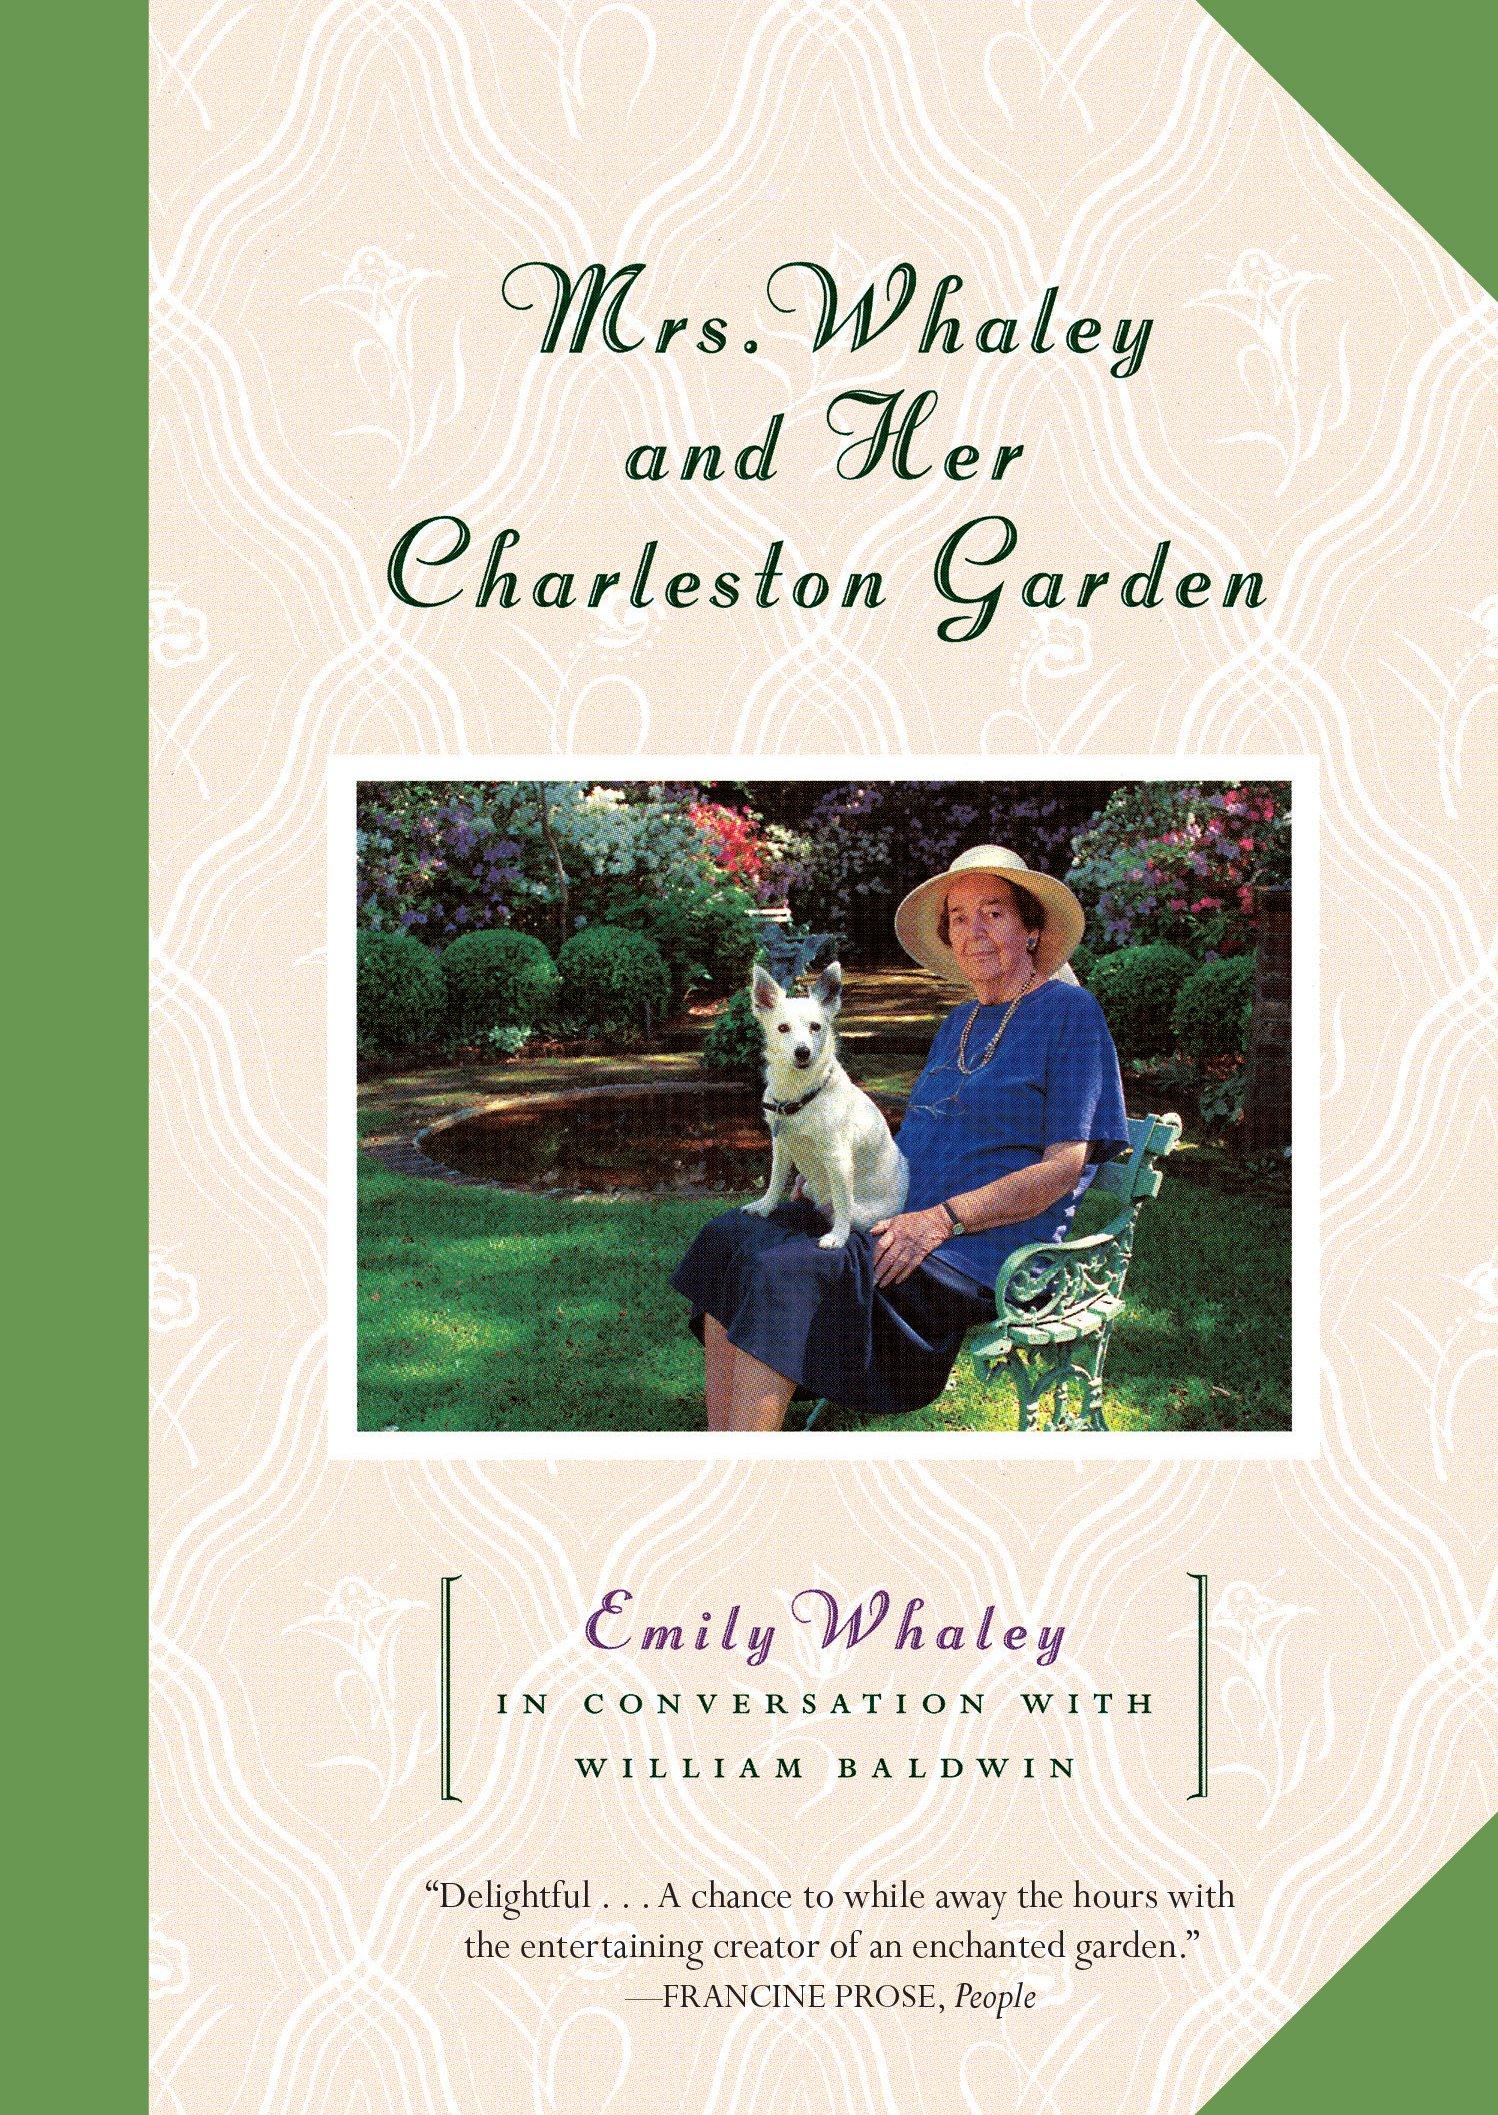 Mrs. Whaley and Her Charleston Garden Paperback – November 28, 2017 Emily Whaley Algonquin Books 1616208457 Essays & Narratives